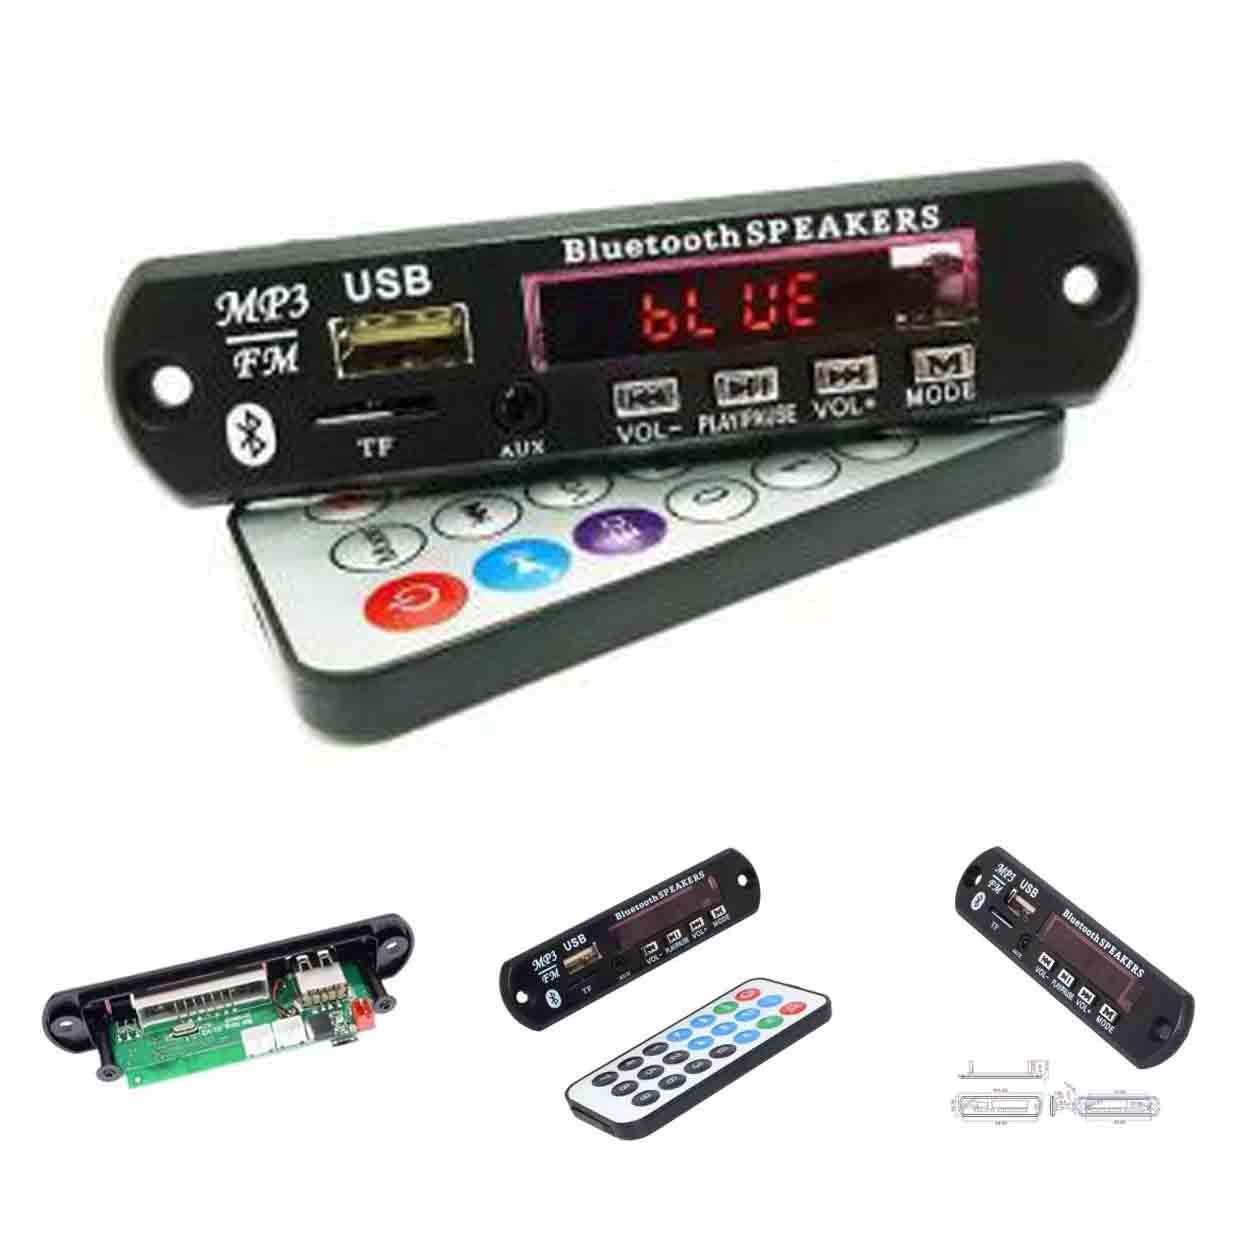 12V Wireless Bluetooth MP3 Decoding Board WAV+WMA+MP3 Micro USB/SD Card